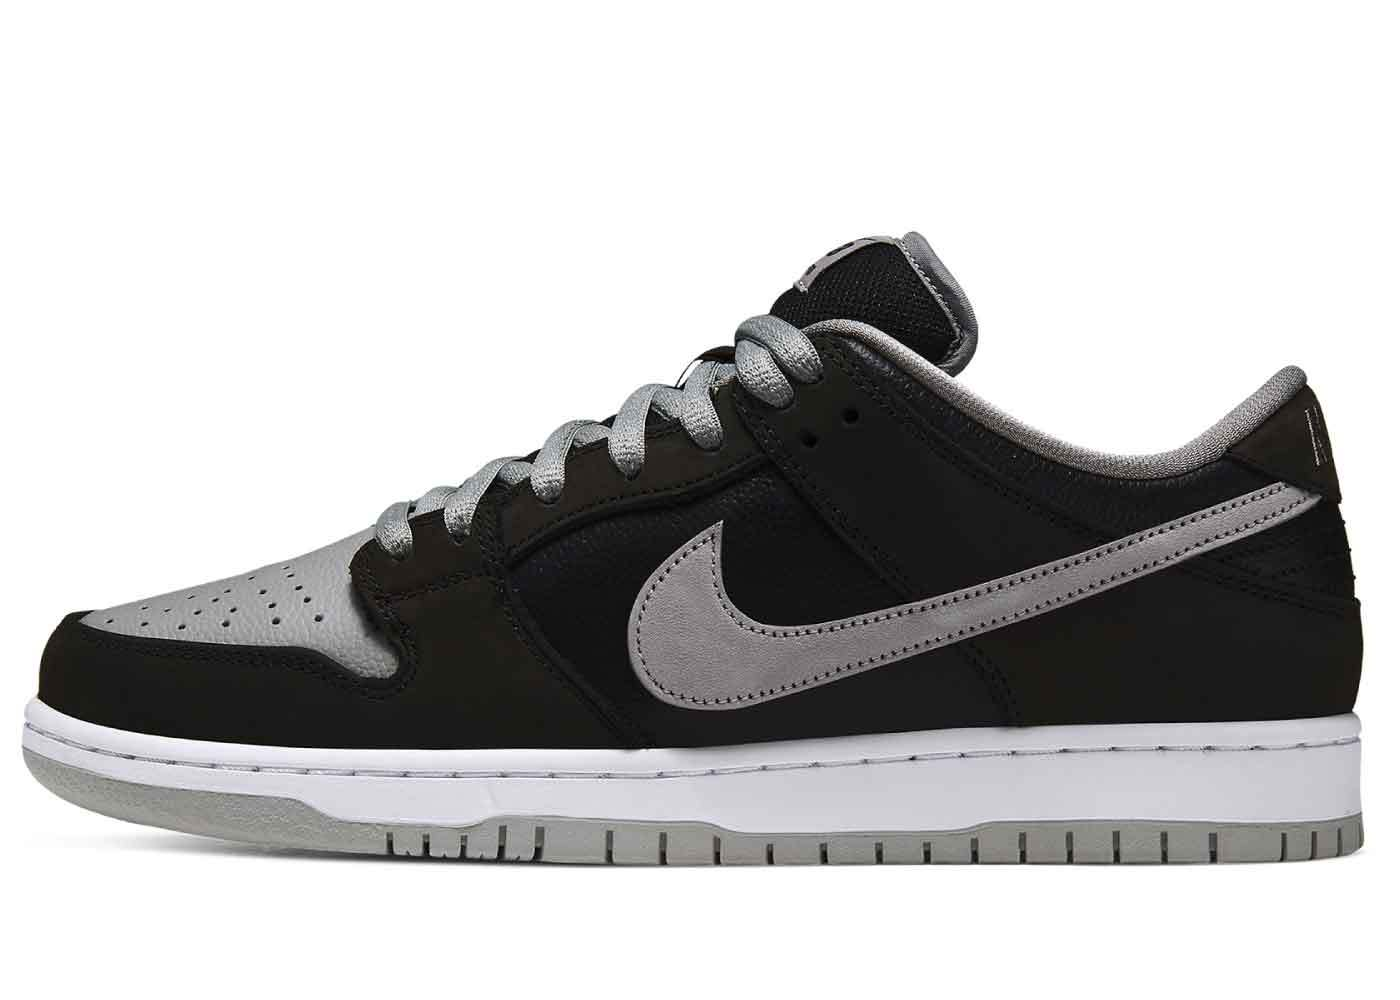 Nike SB Dunk Low Pro Shadowの写真